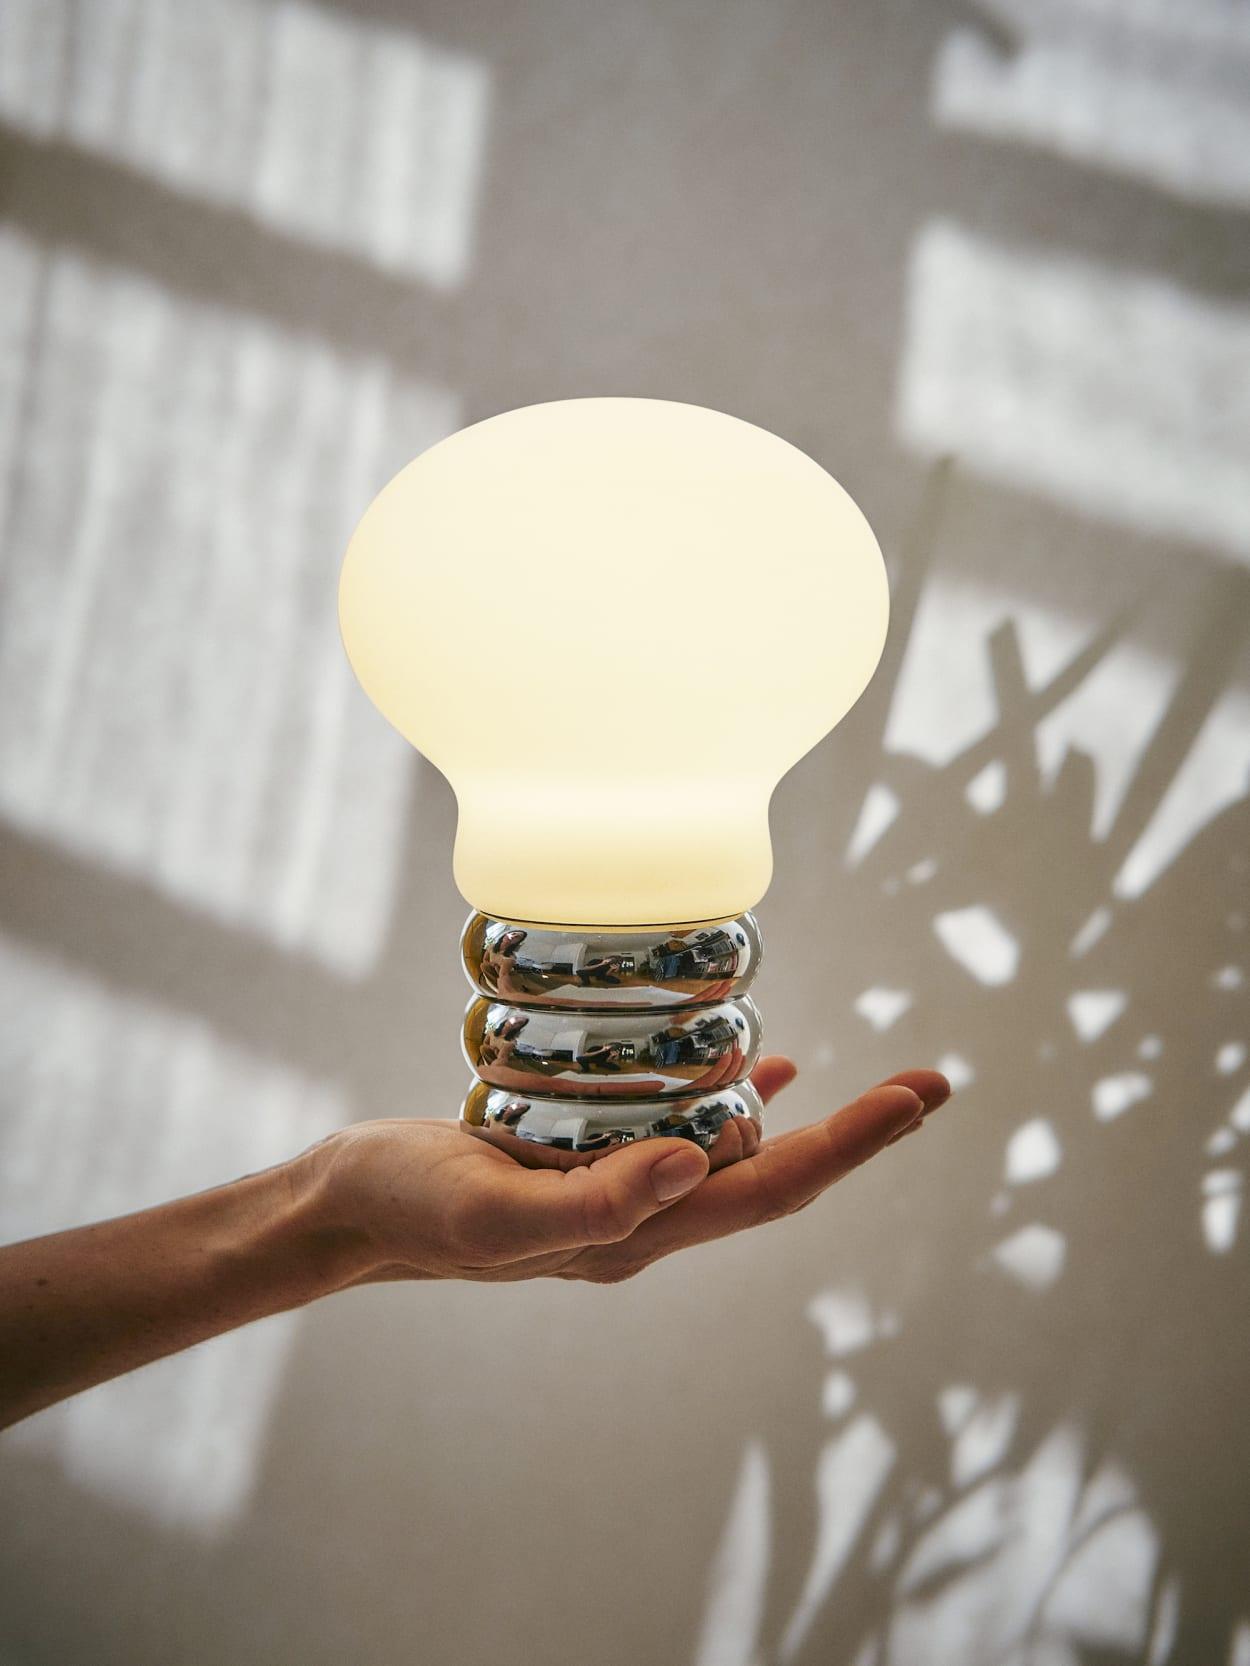 b.bulb, Ingo Maurer